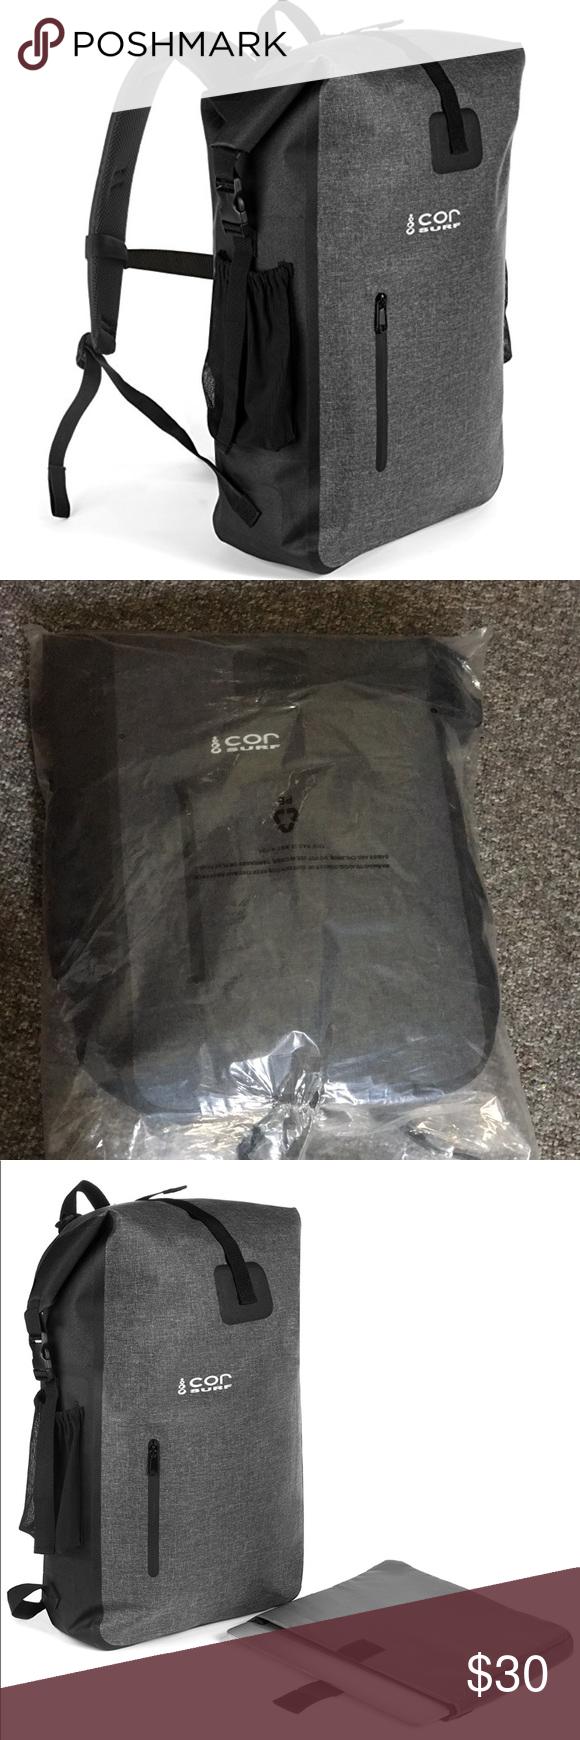 930b31d65d2b Cor surf waterproof backpack ultralight Waterproof Backpack - Ultralight  40L Dry Pack with Removable Laptop Sleeve